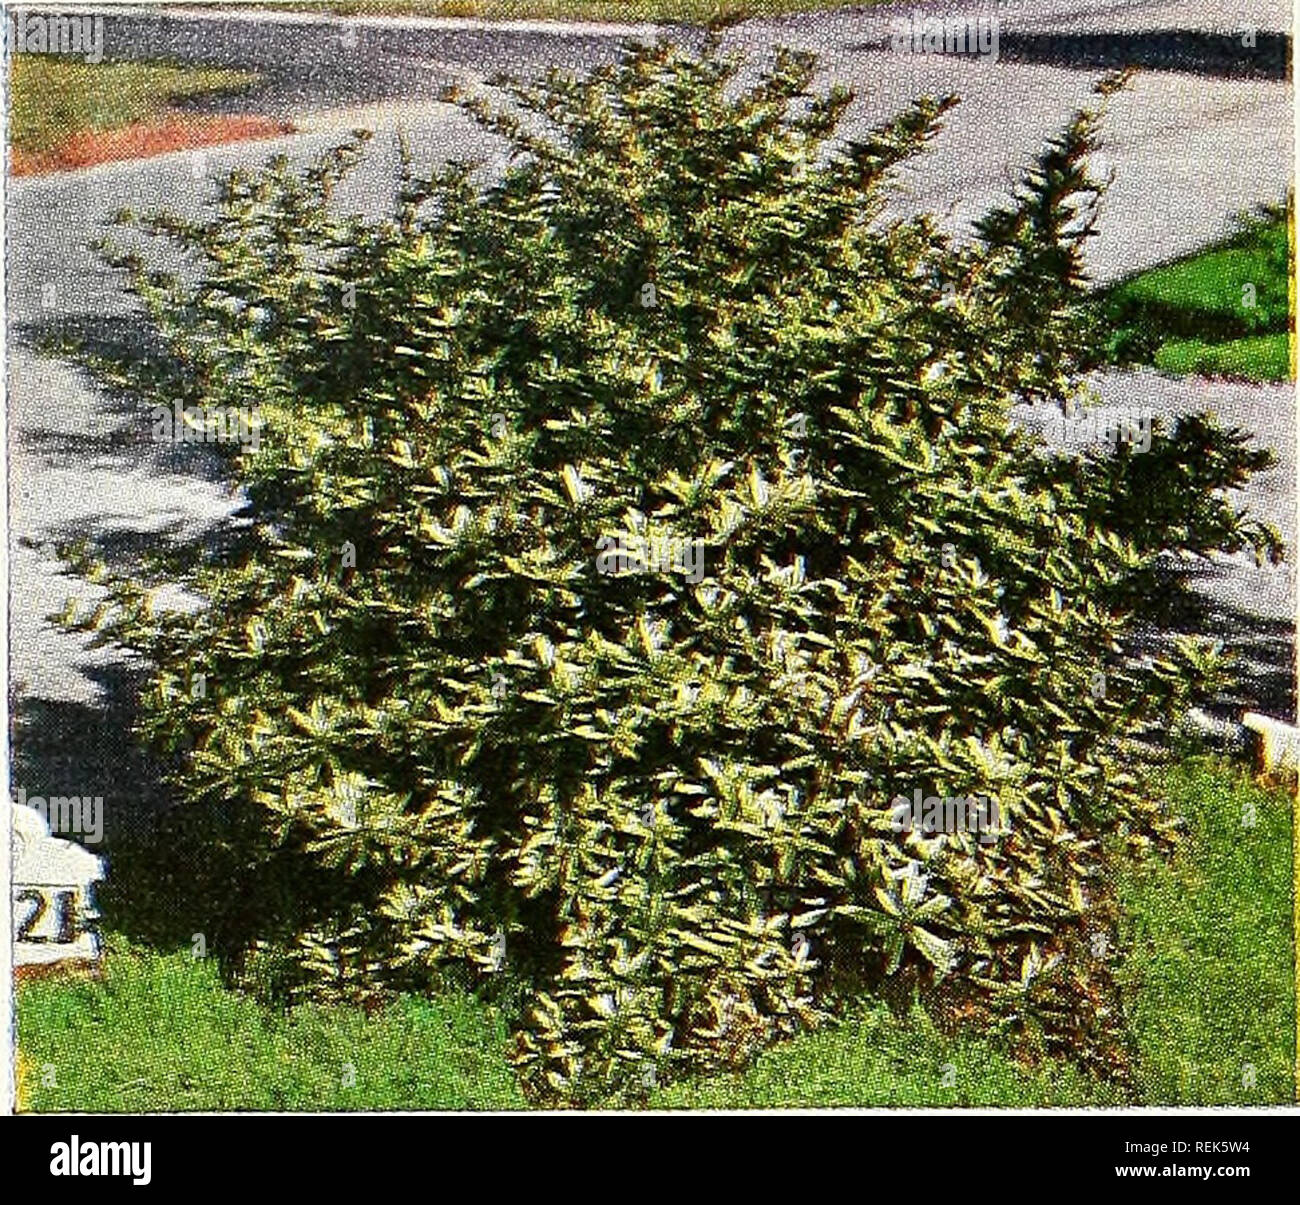 C M Hobbs Sons Nurseries Horticulture Catalogs Evergreens